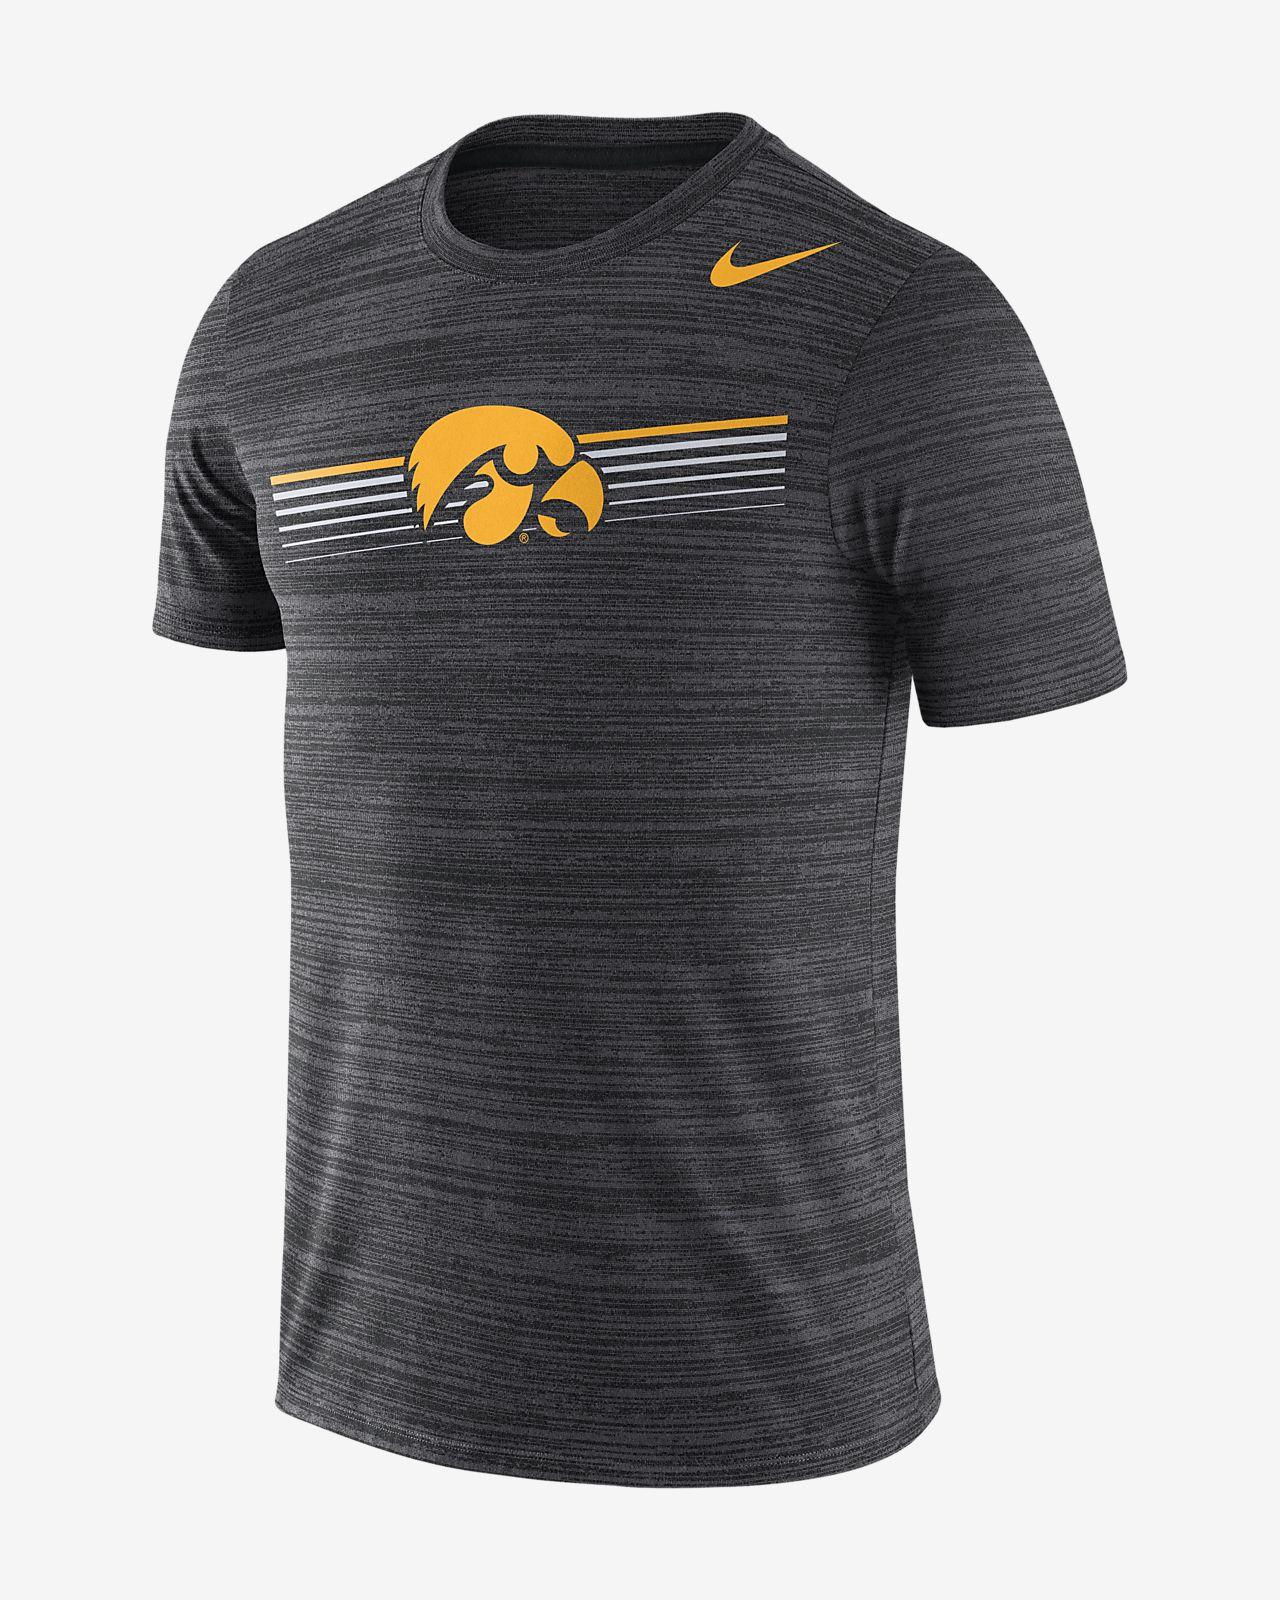 Nike College Dri-FIT Legend Velocity (Iowa) Men's T-Shirt